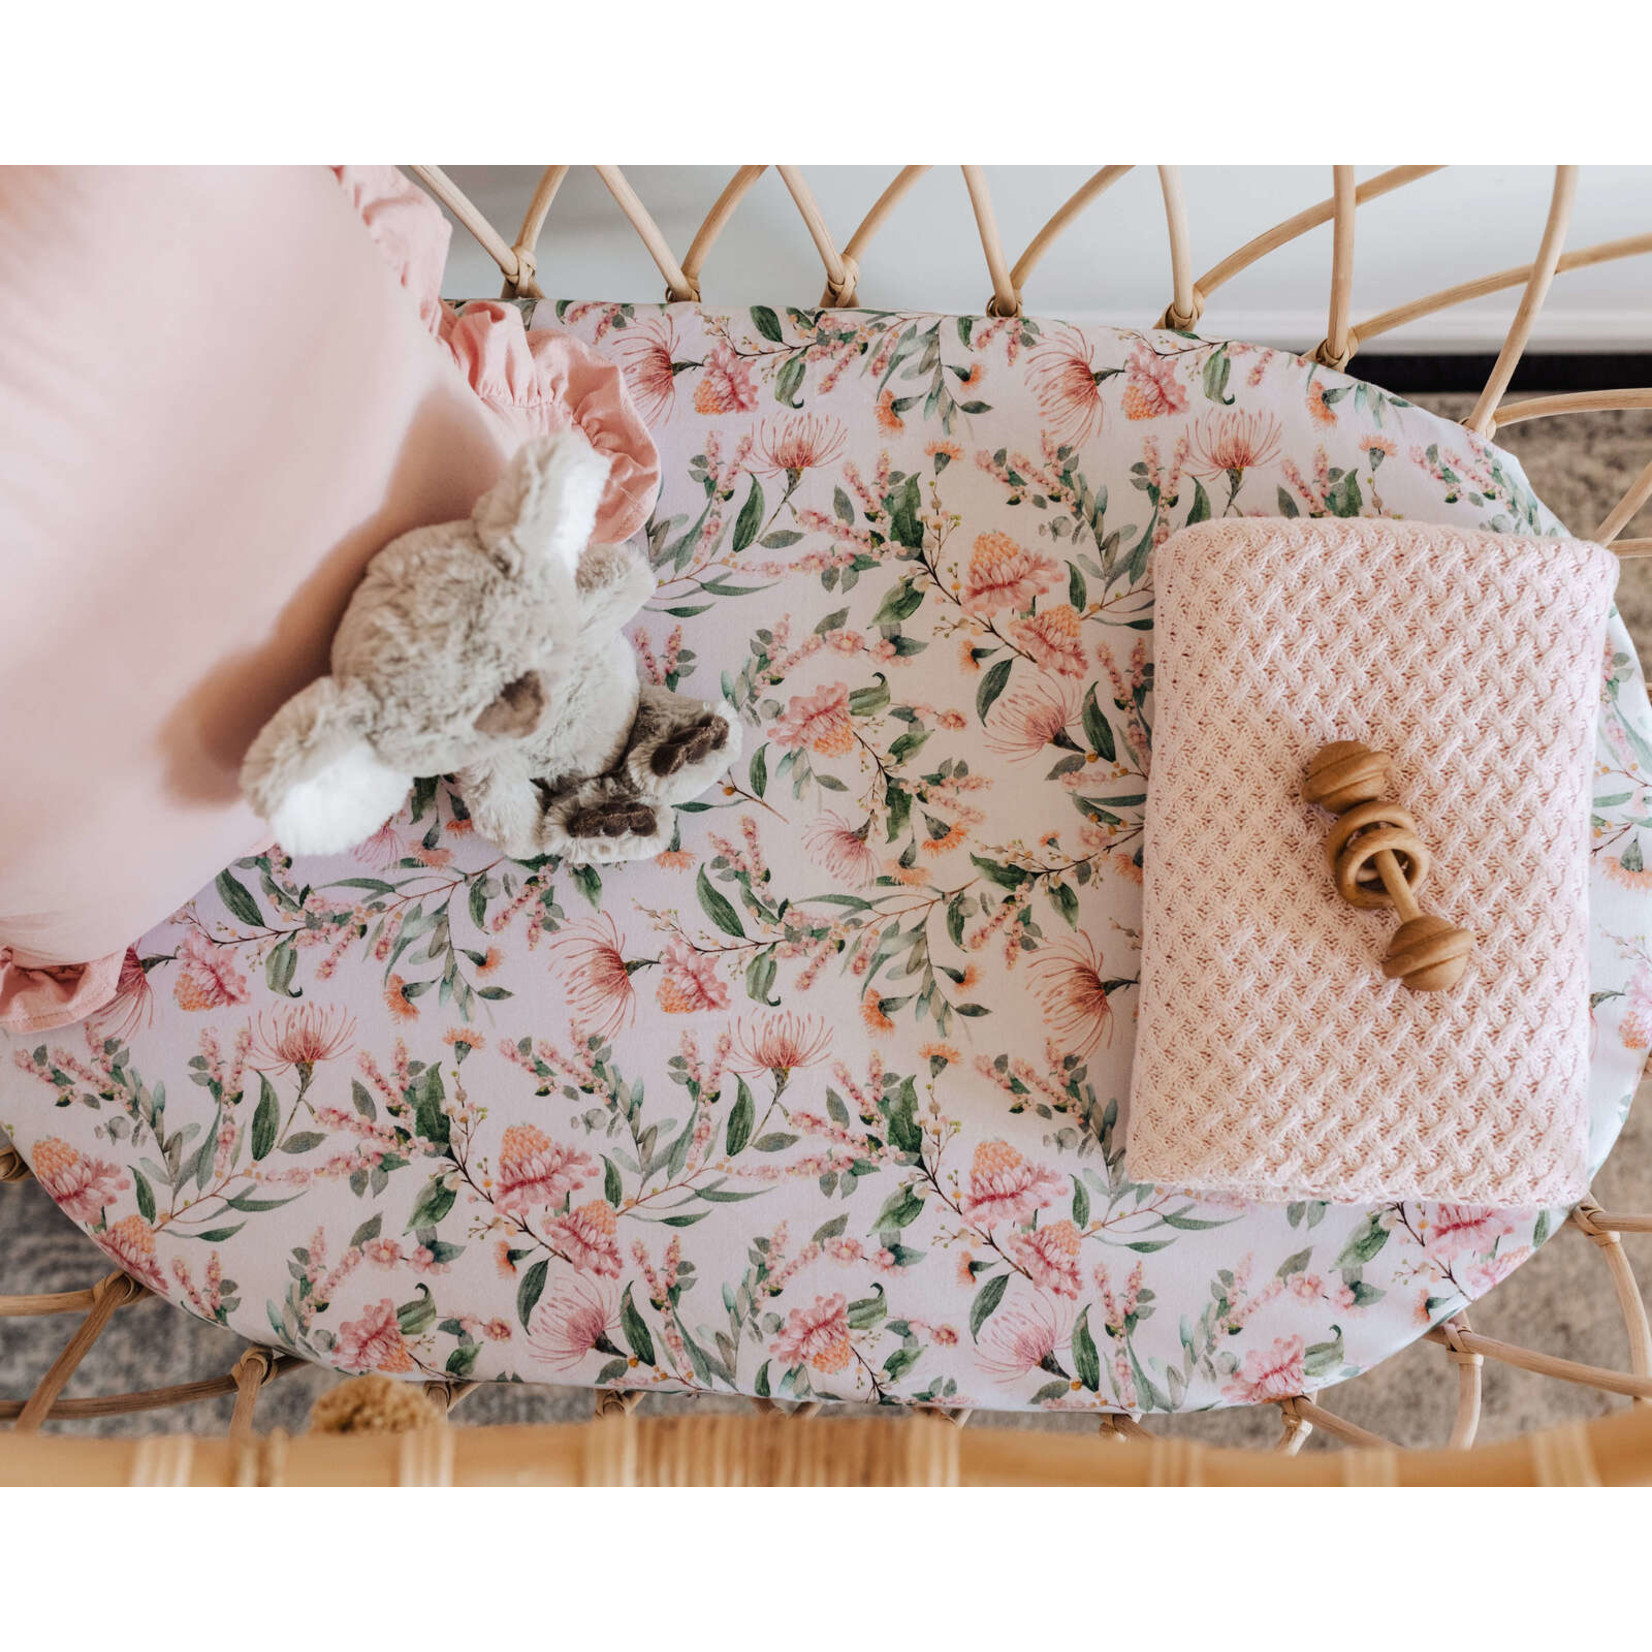 Snuggle Hunny °° Housse de table à langer Fleuri